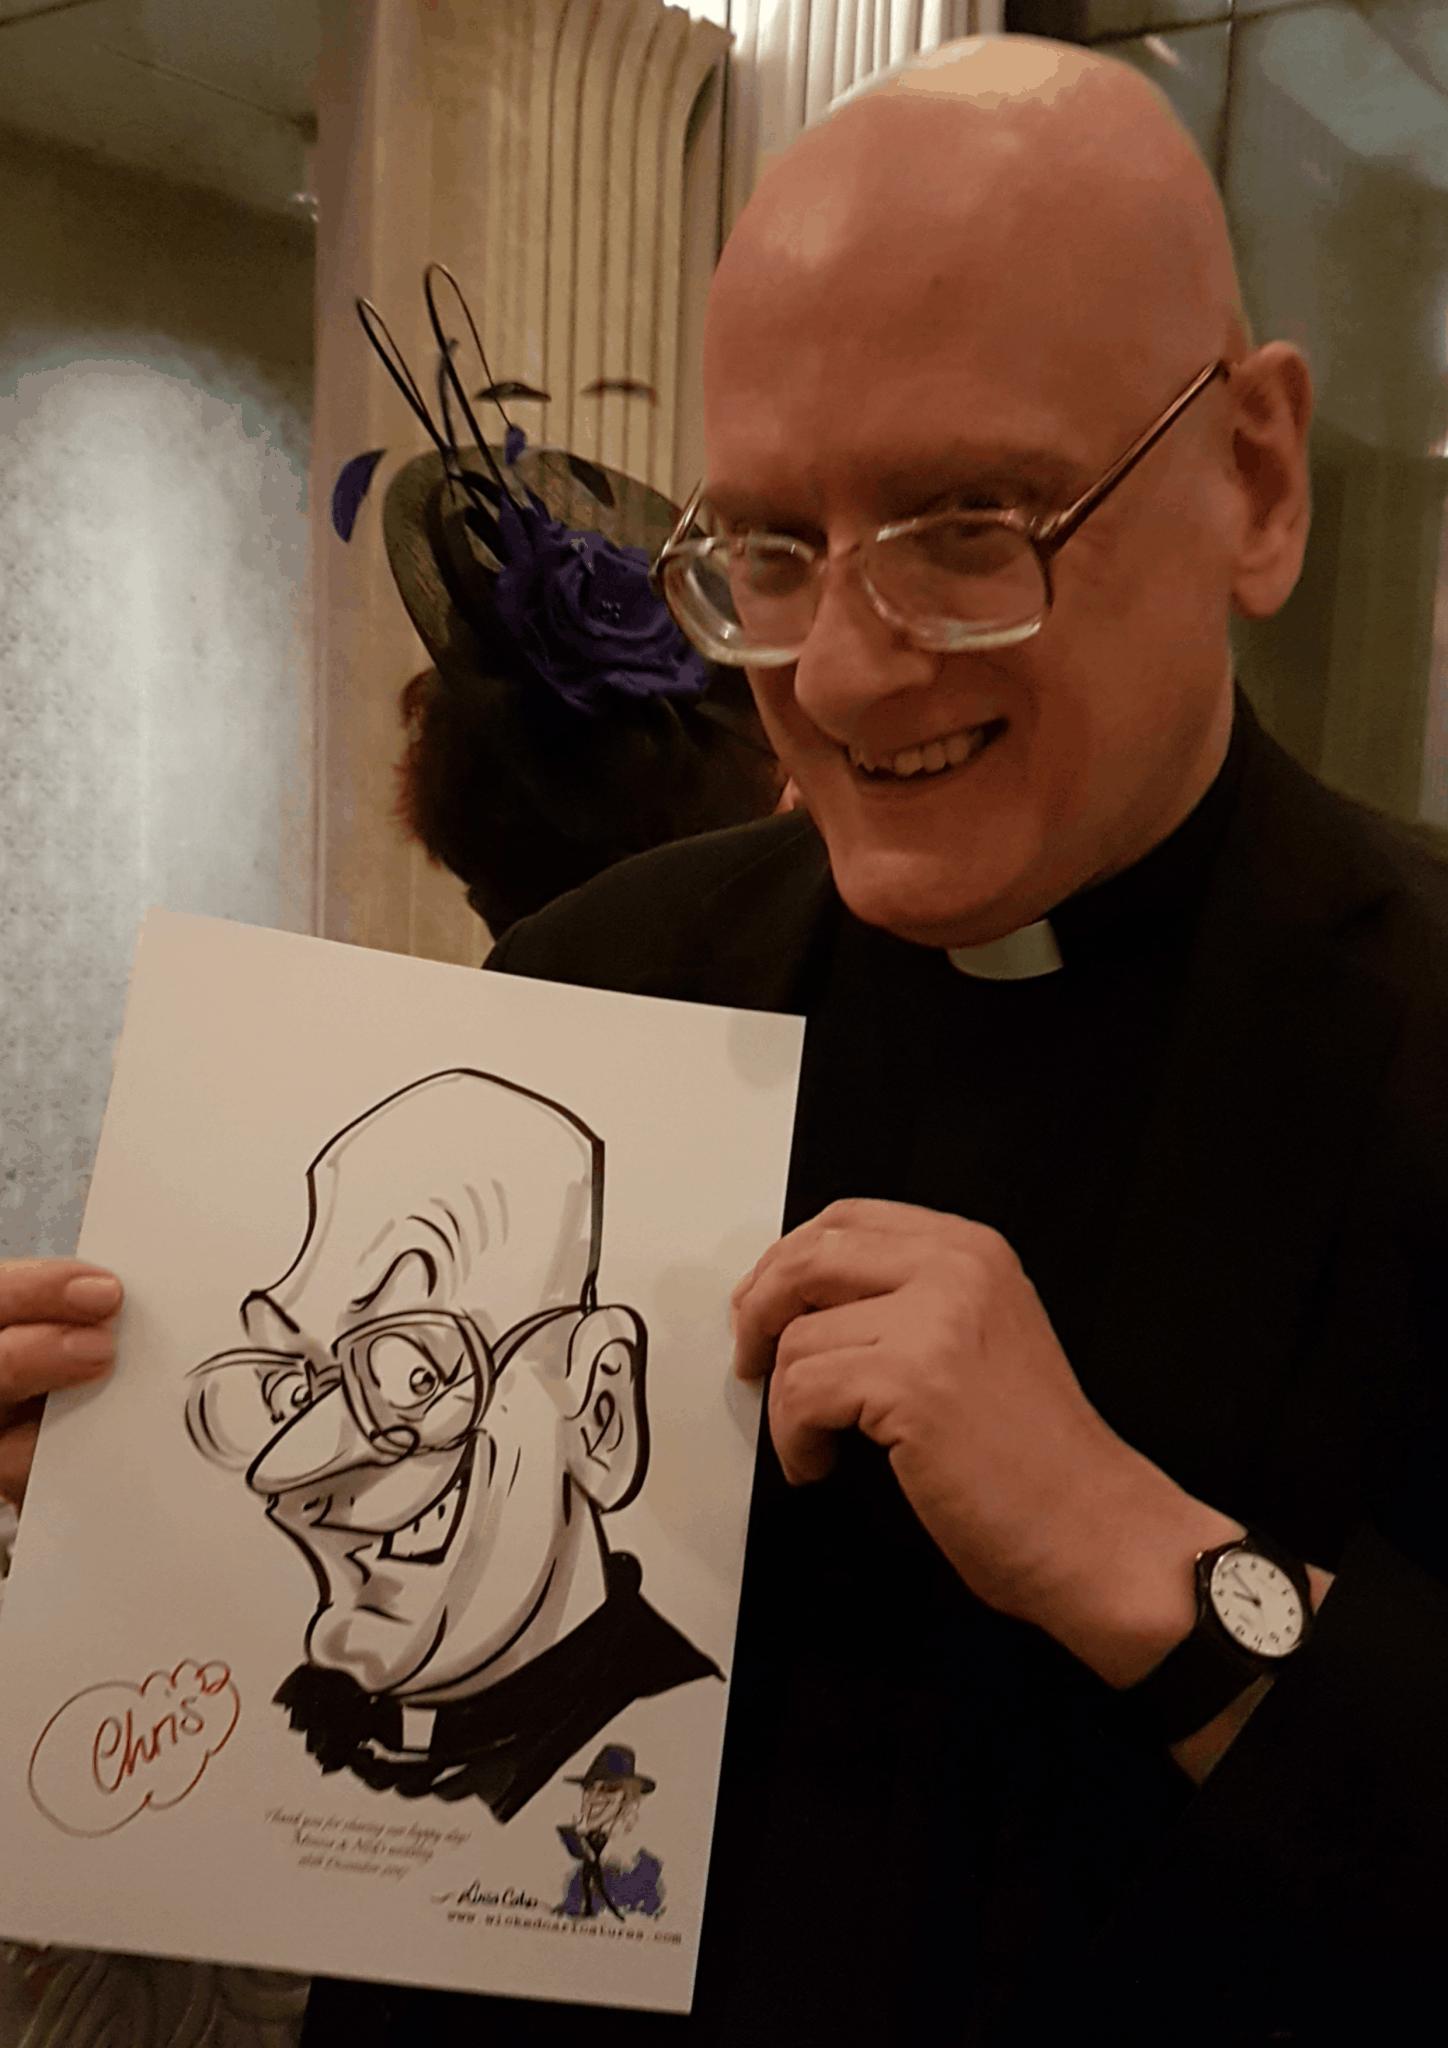 vicar caricature Wicked Caricatures Ltd – by caricaturist Luisa Calvo